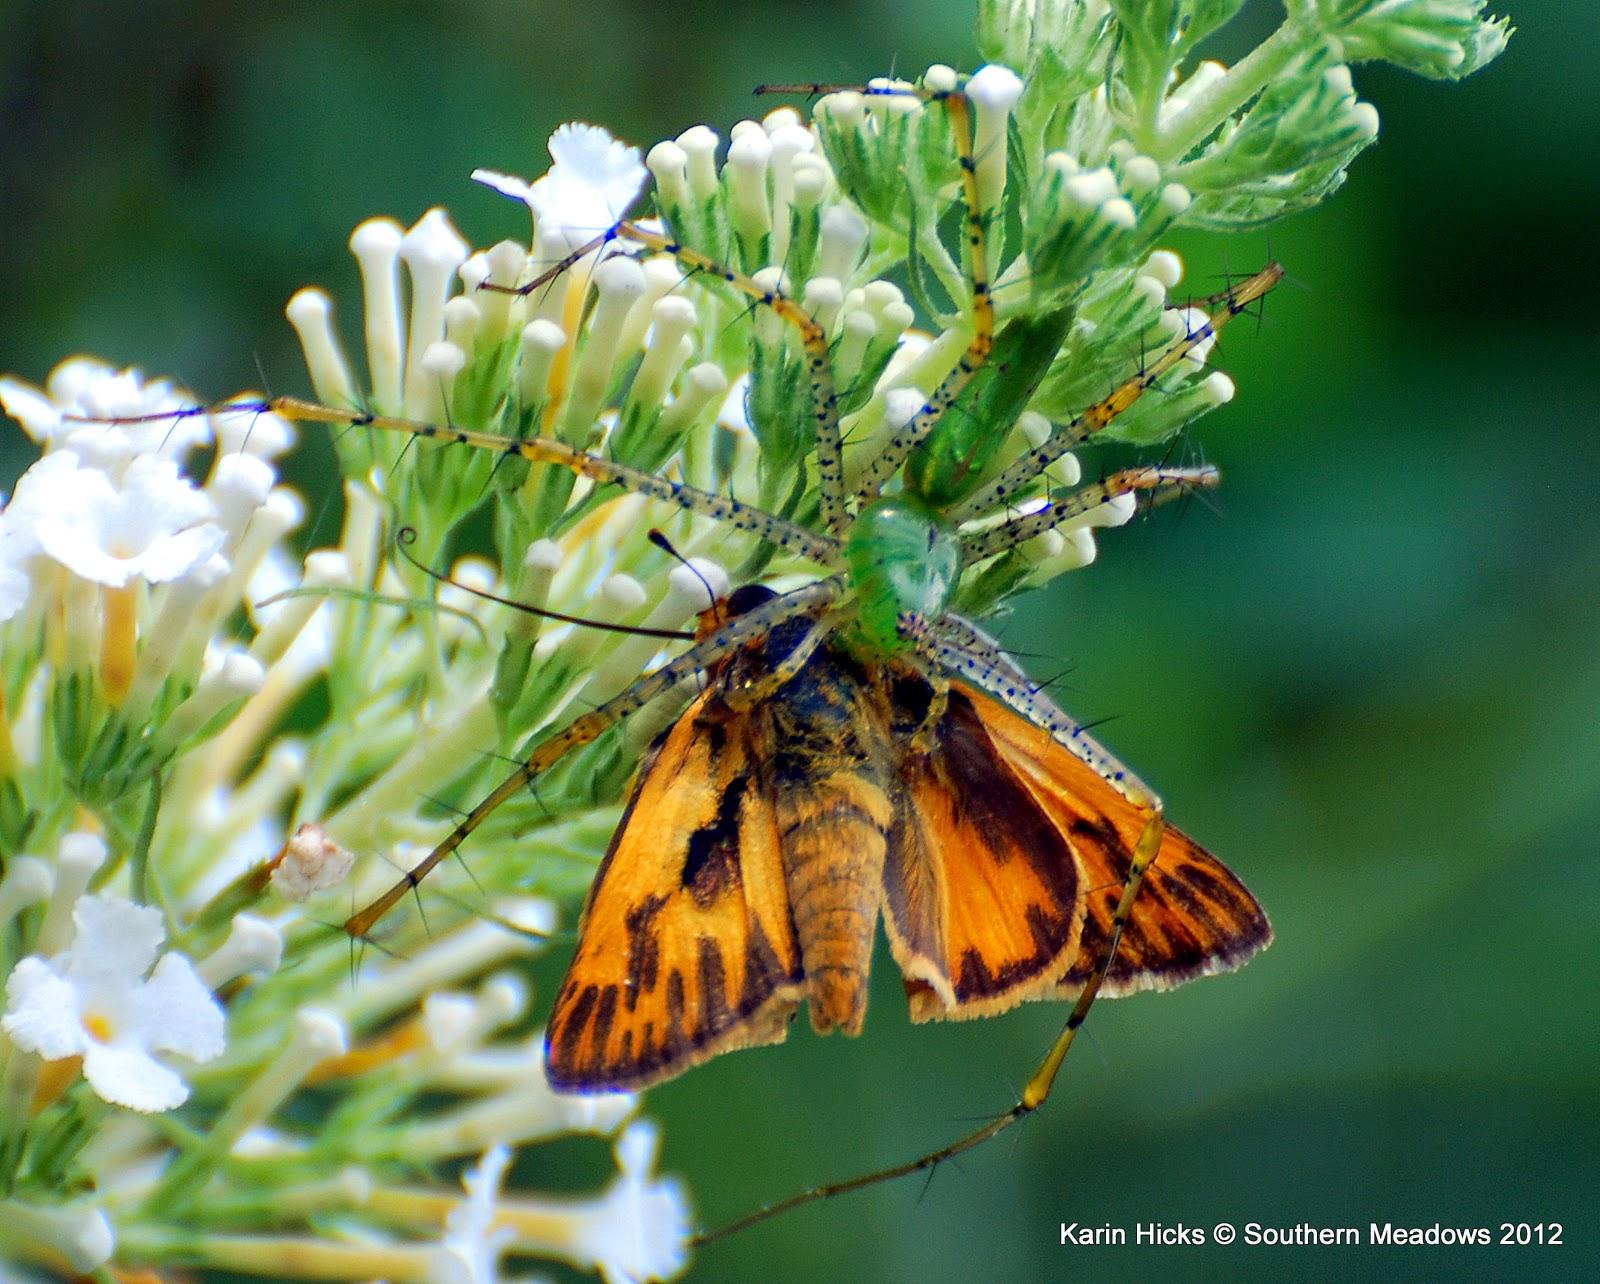 Southern Meadows: Beyond Butterflies